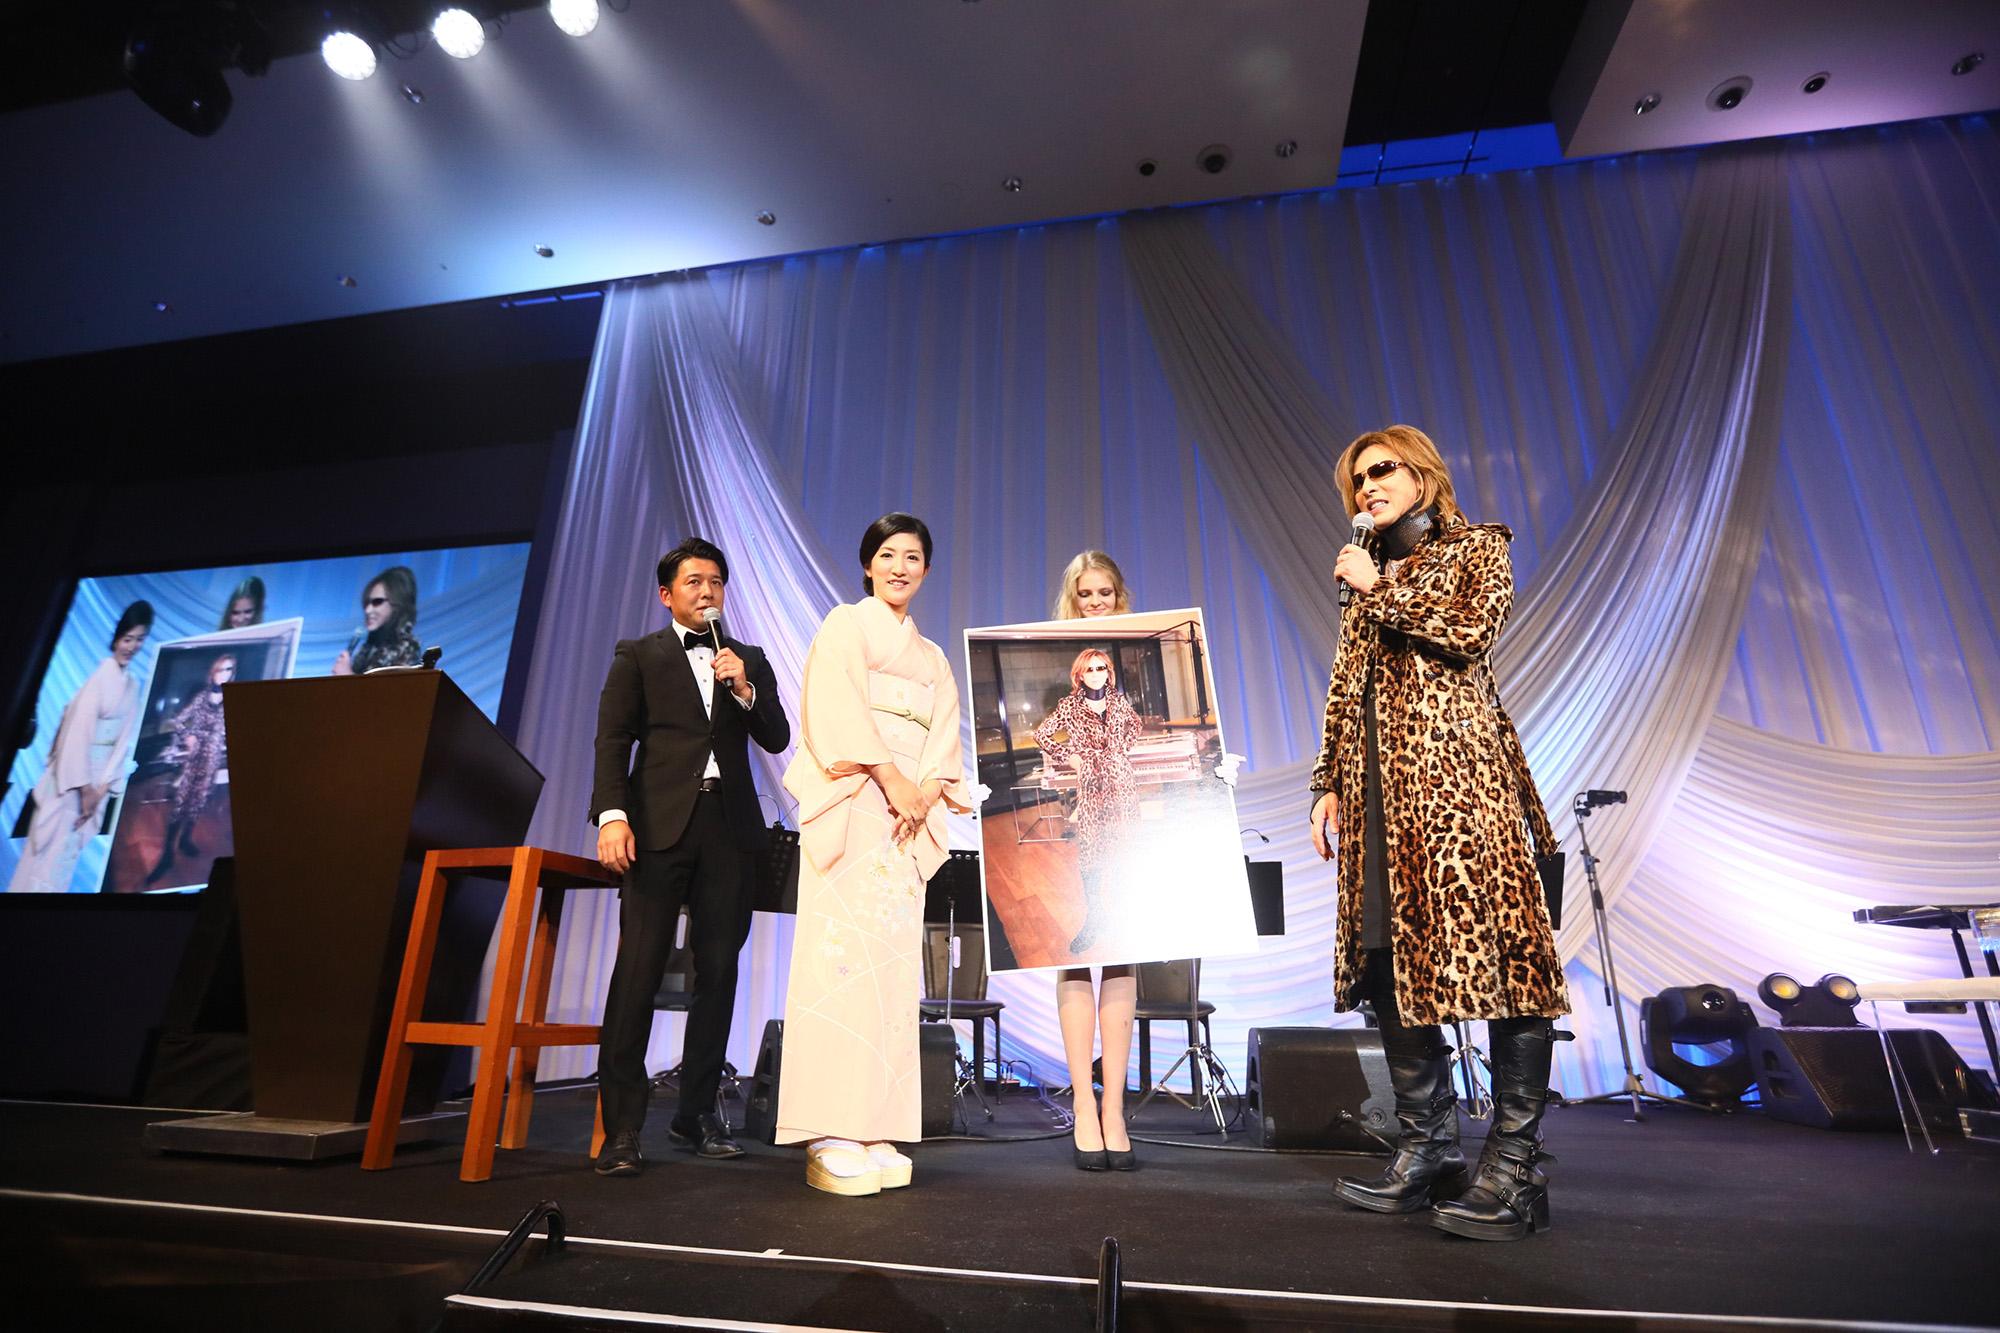 JRock247-Yoshiki-Dinner-Show-Tokyo-20170902-0219